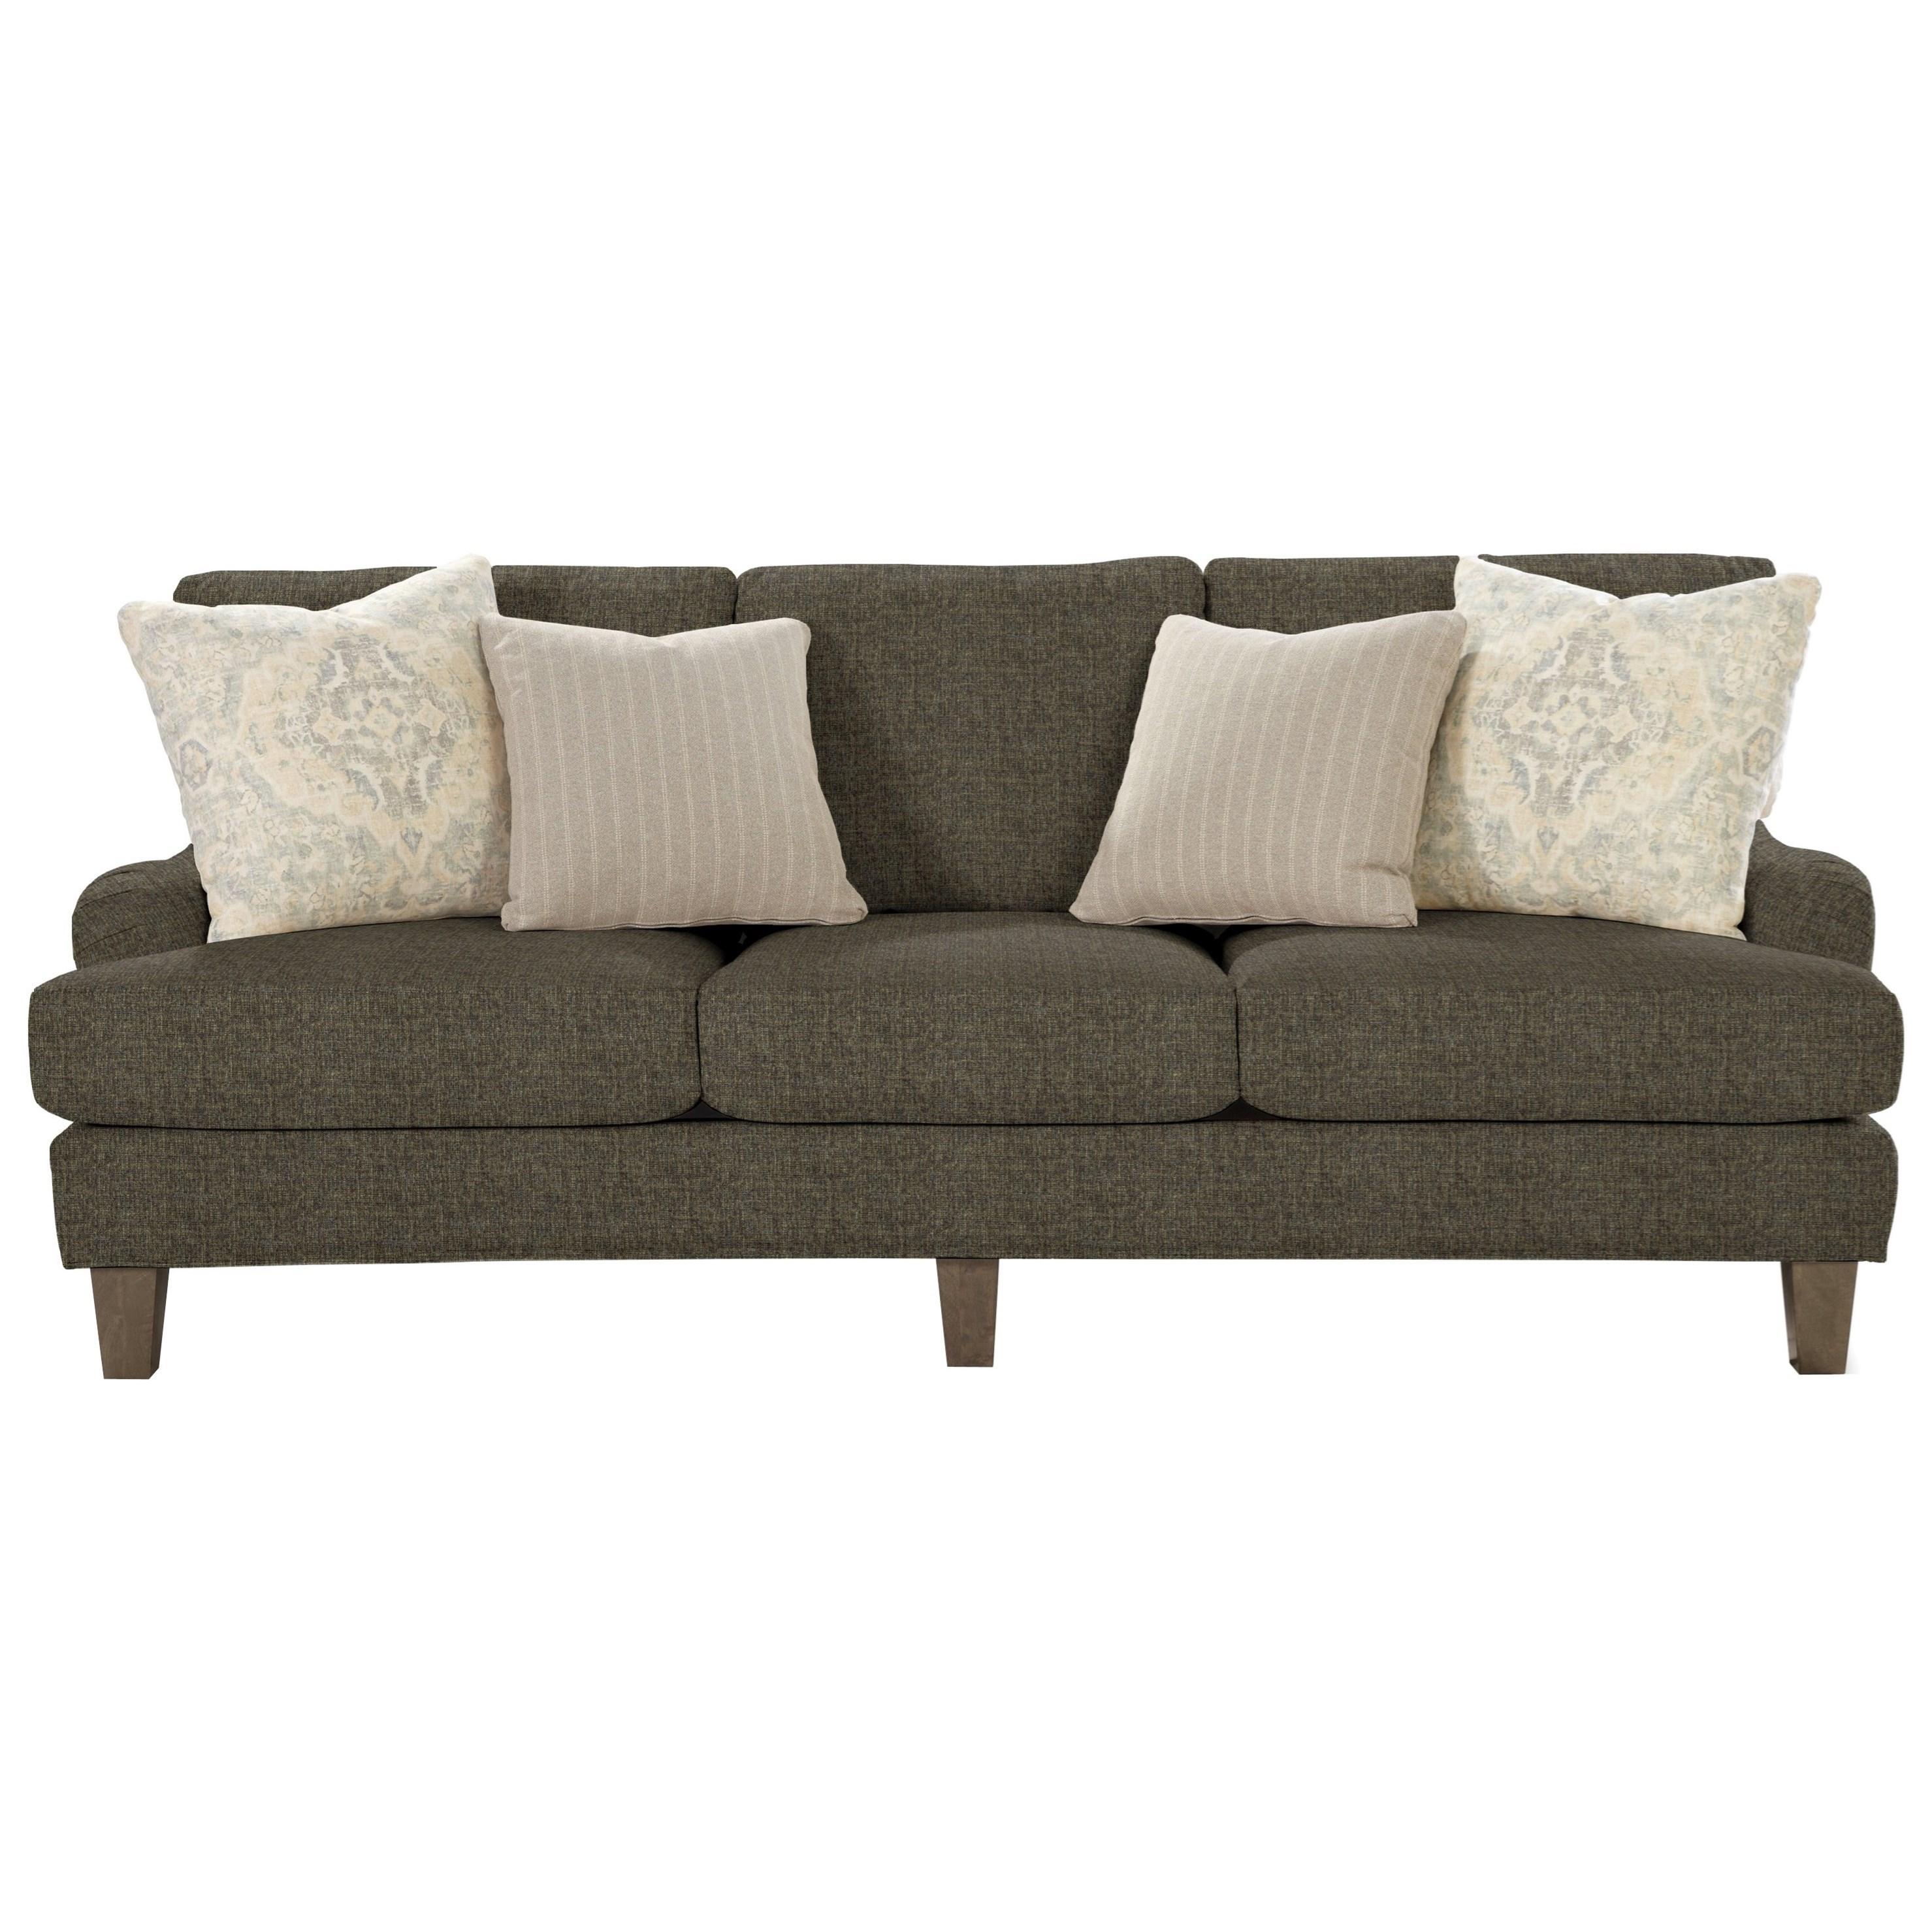 Craftmaster 7430 Sofa - Item Number: 743050-AUBURN-23